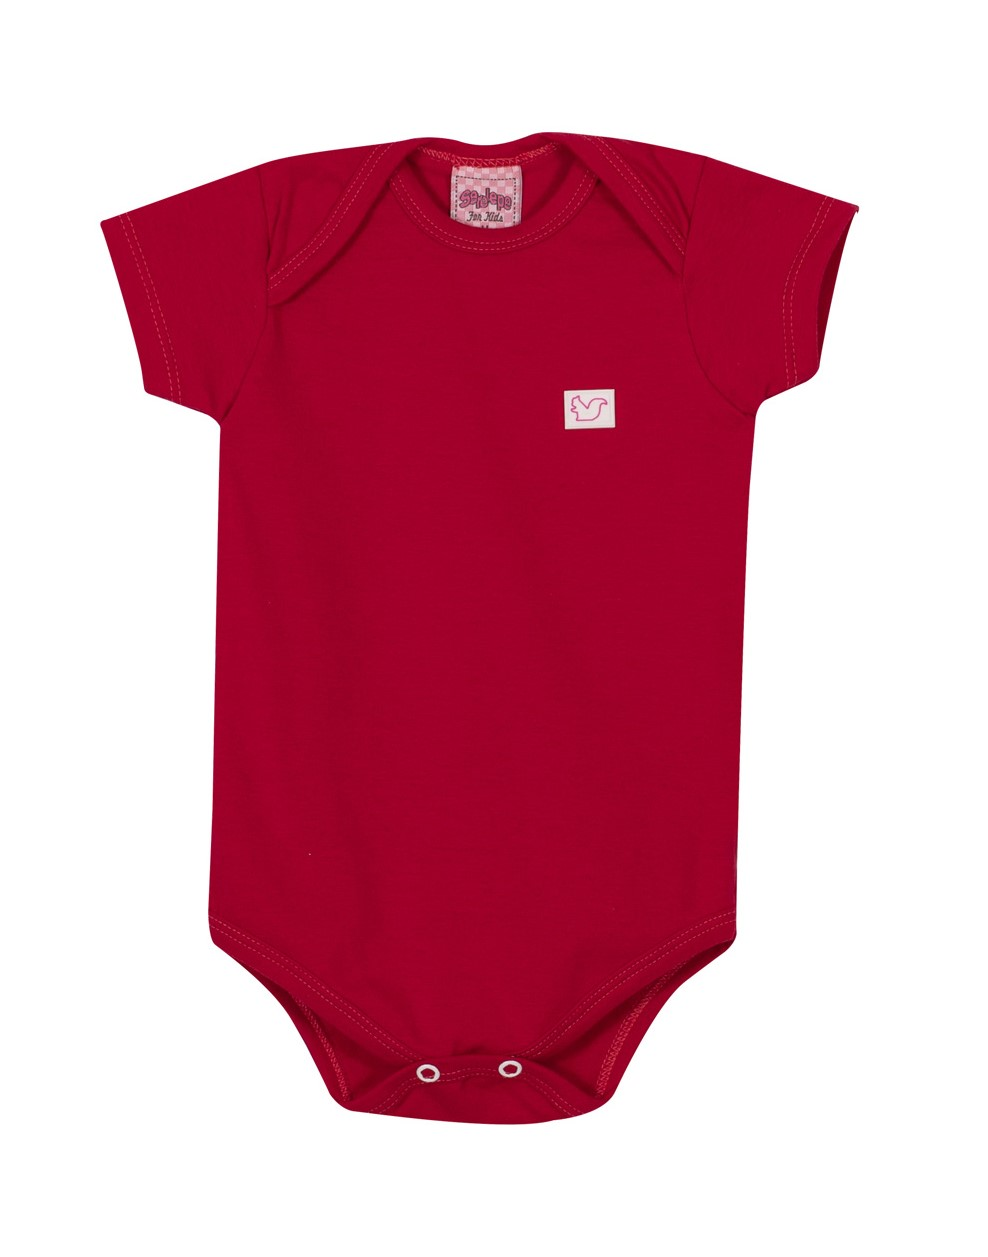 Body Bebê Menino - Vermelho